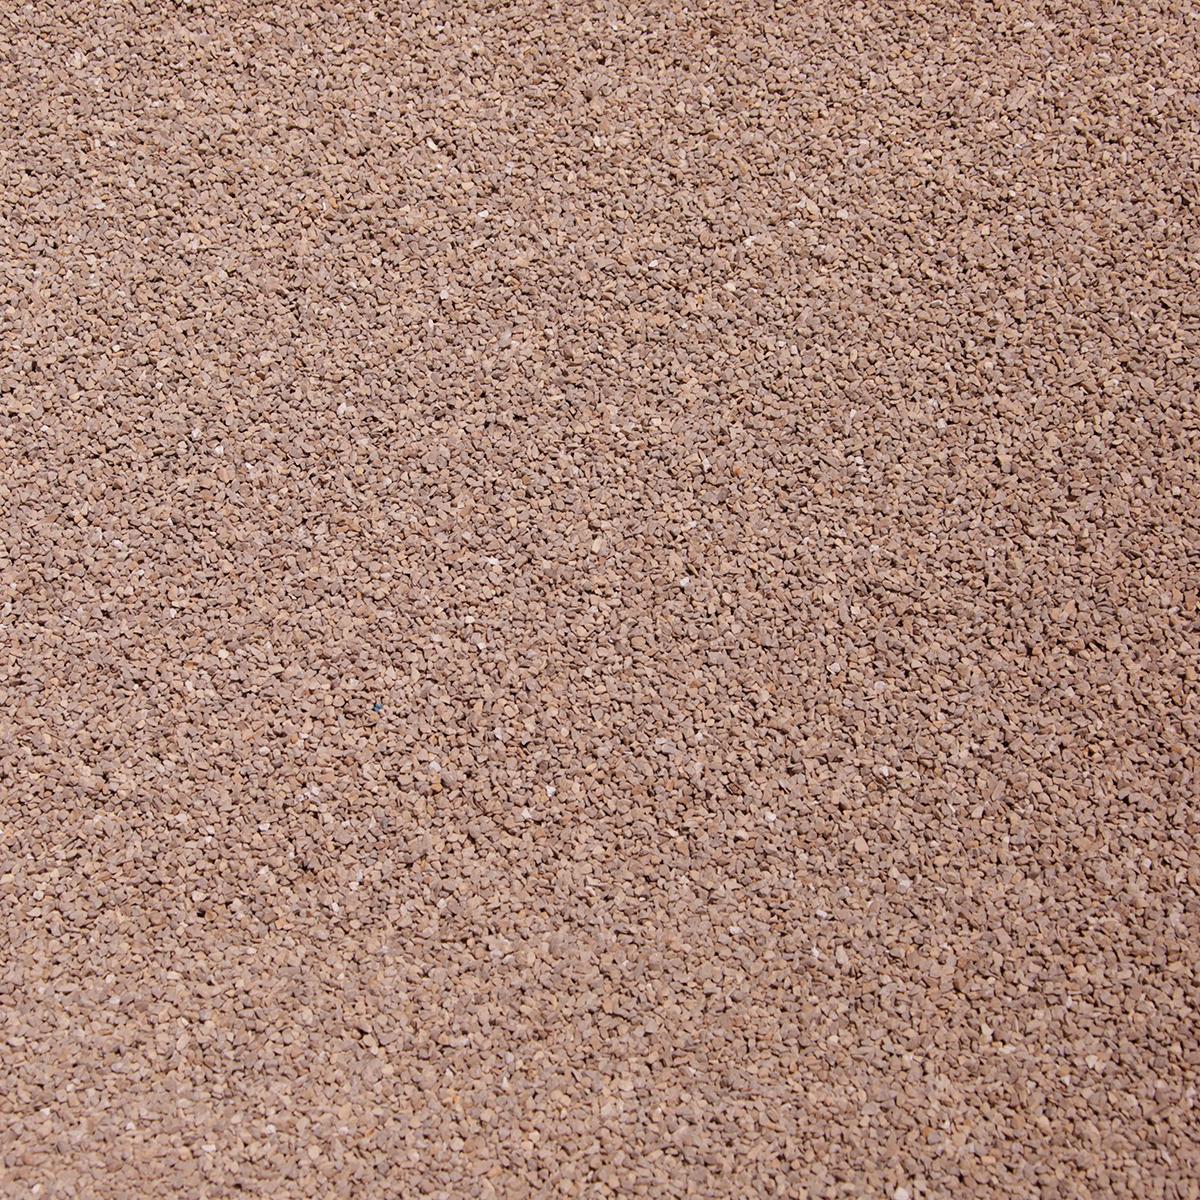 CLEAN CHIPS – Ordovician Dolomitic Limestone